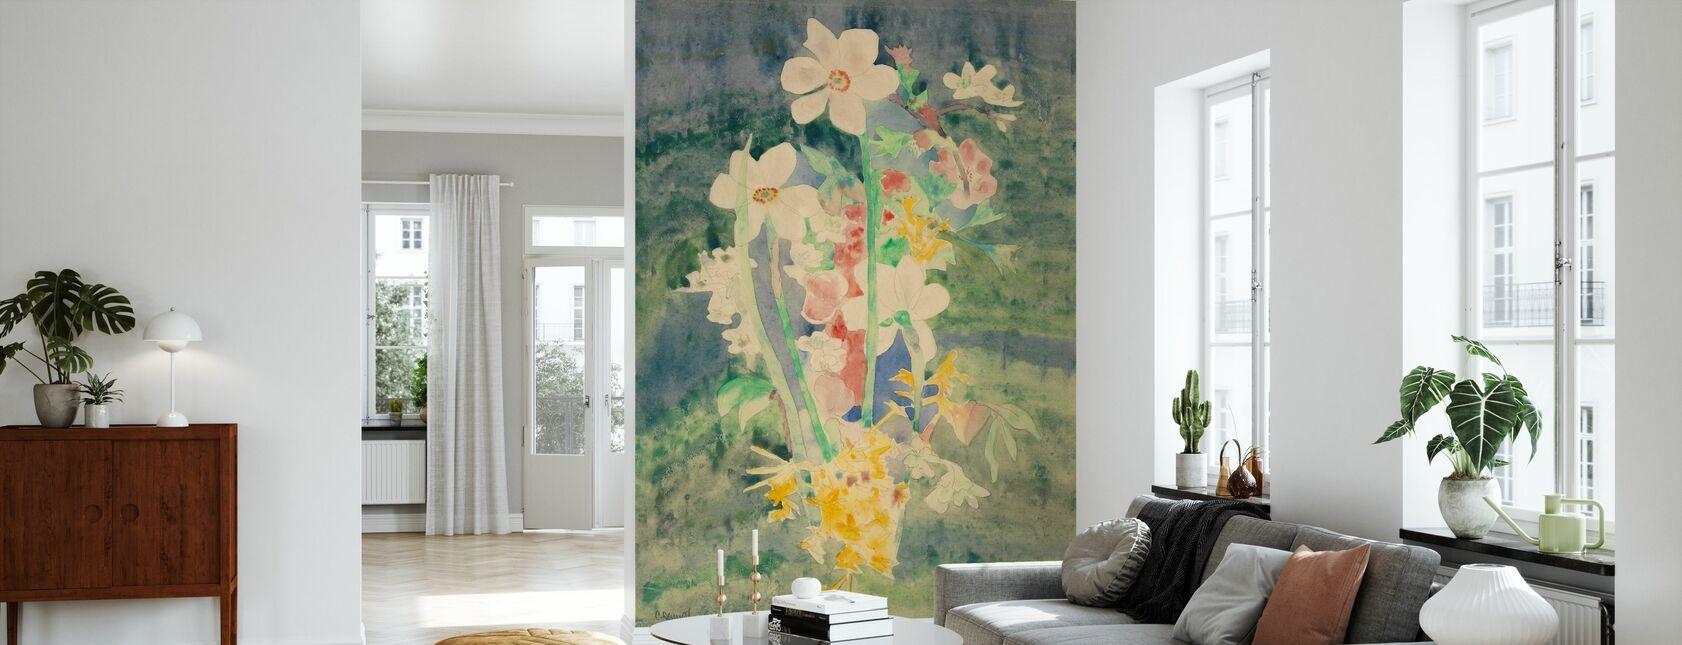 Narcissi - Charles Demuth - Papel pintado - Salón